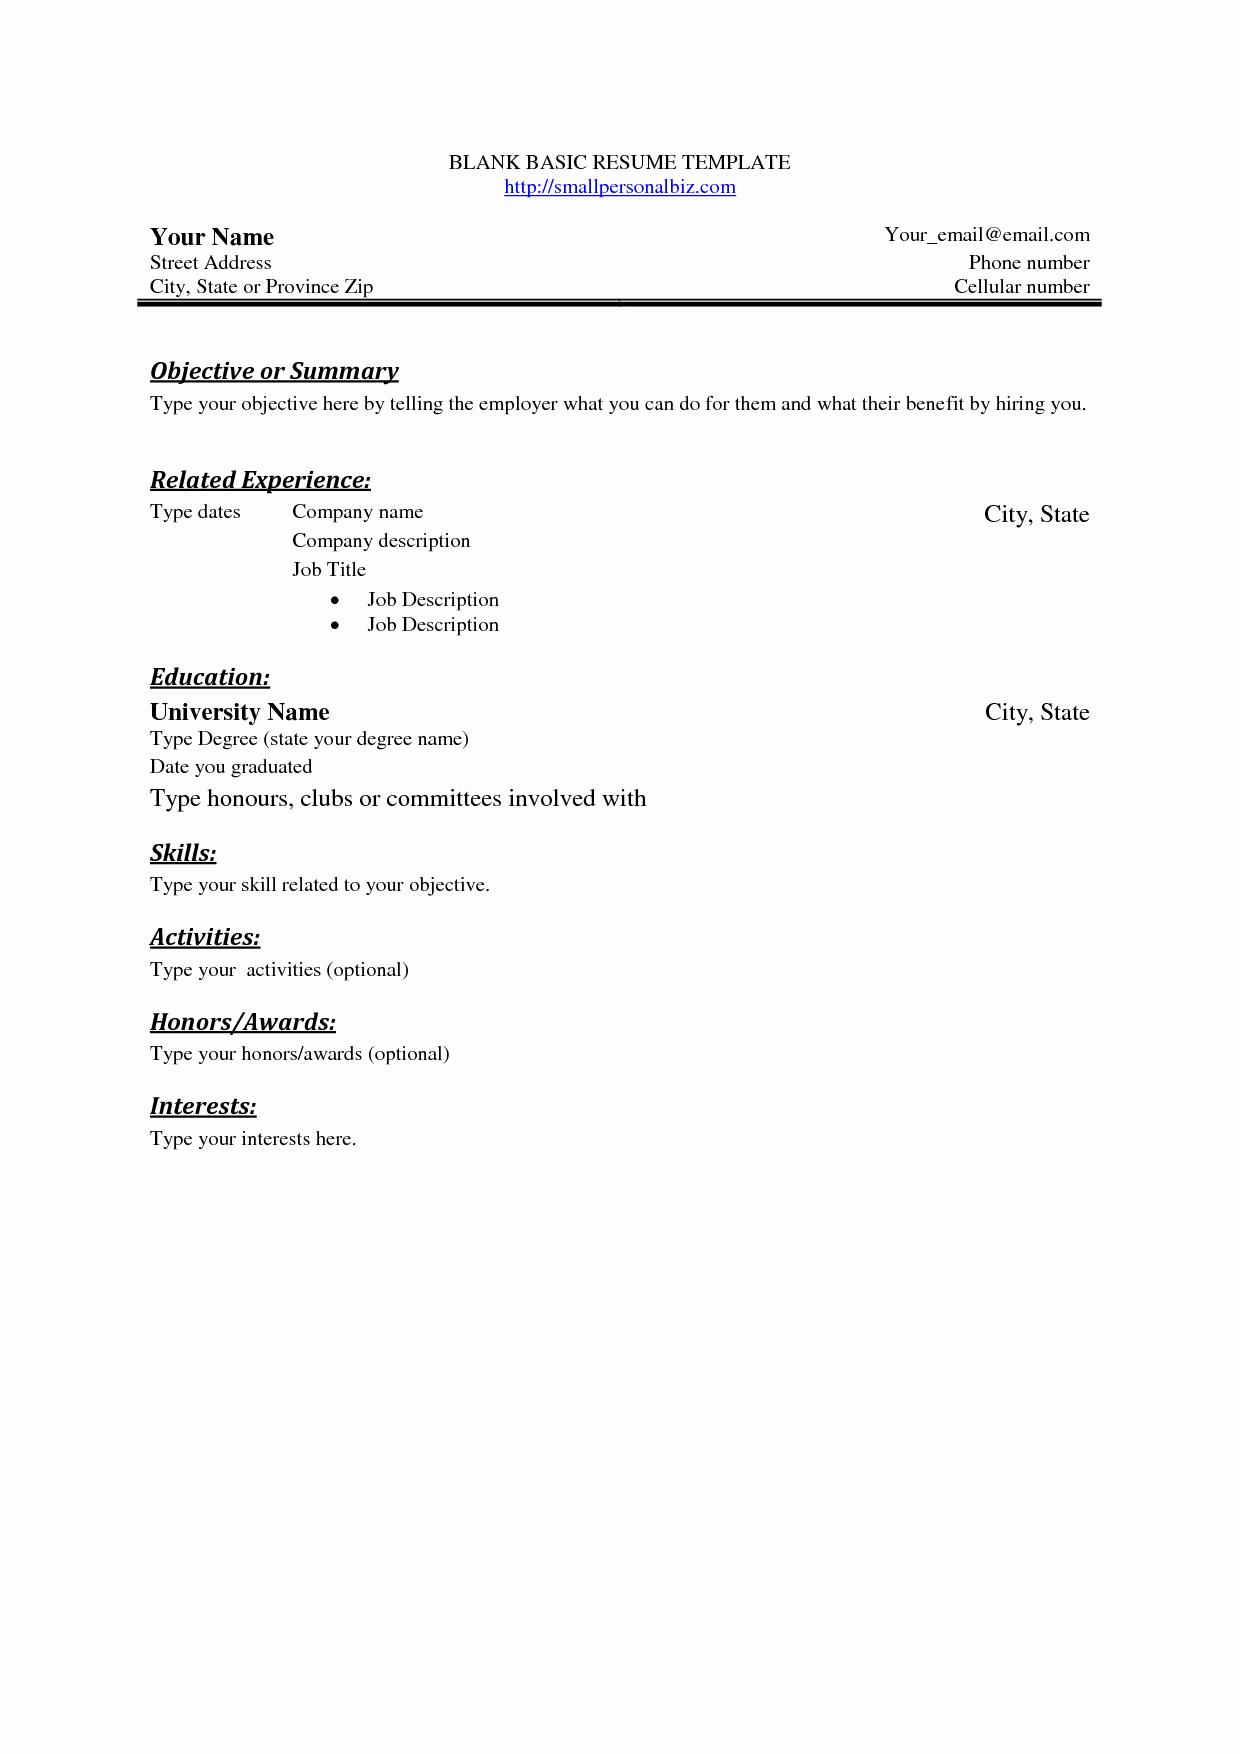 Sample Of A Simple Resume Elegant Pinterest